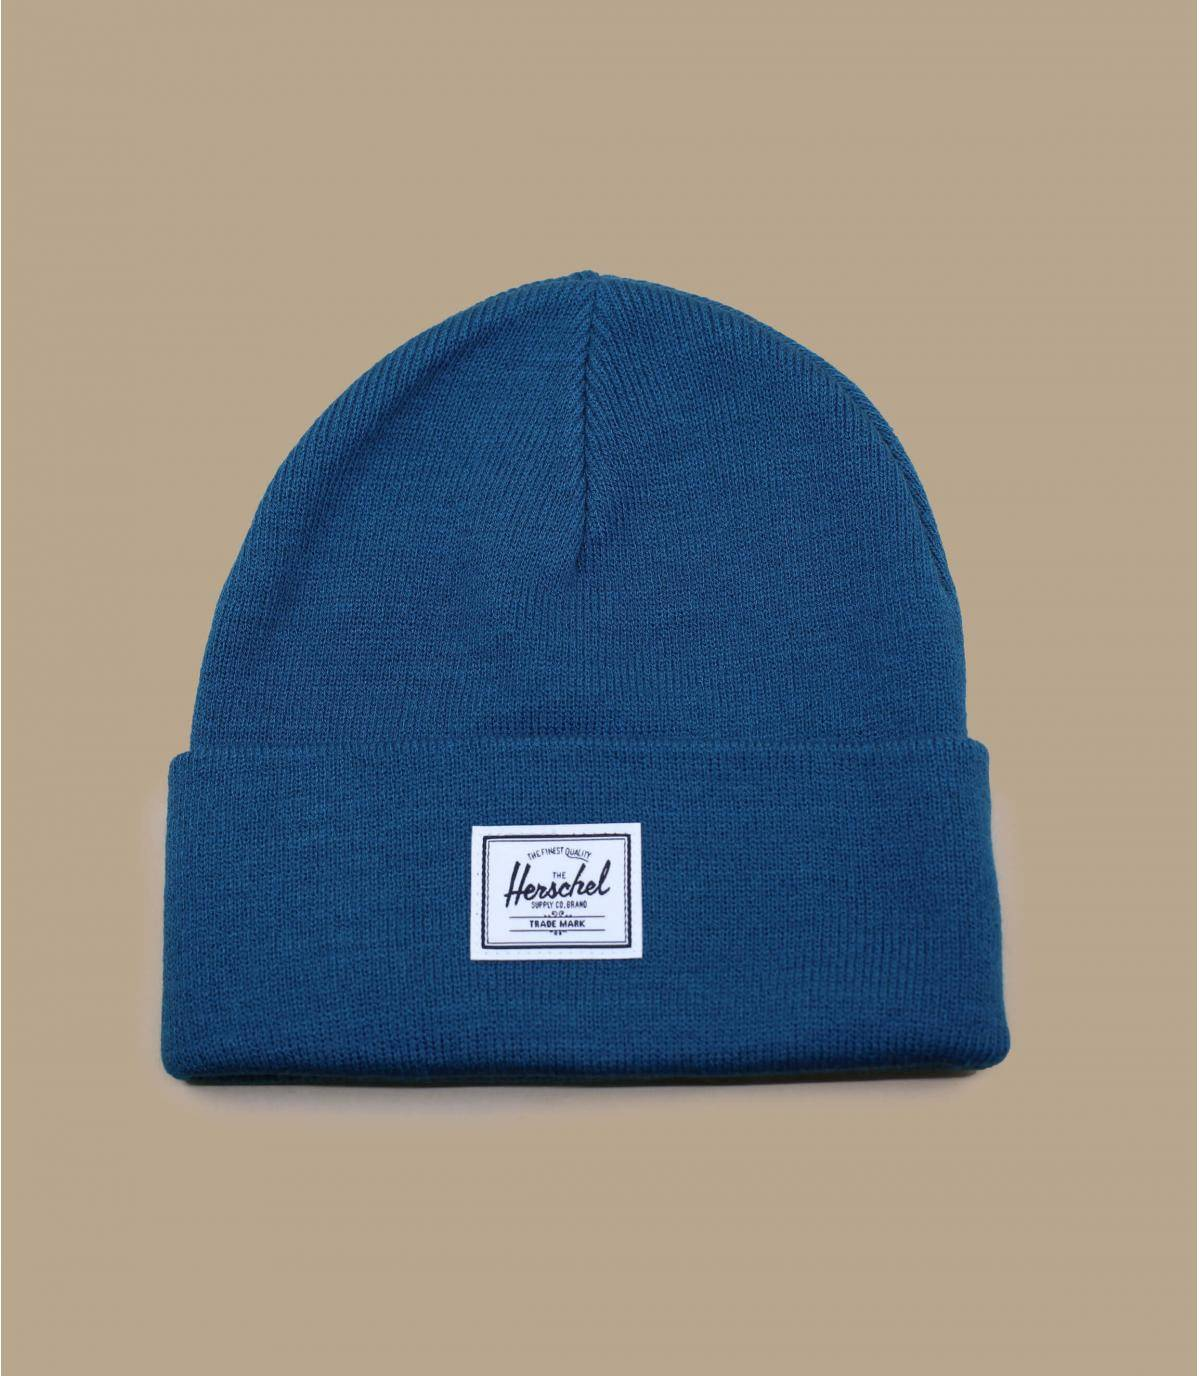 Gorro azul Herschel